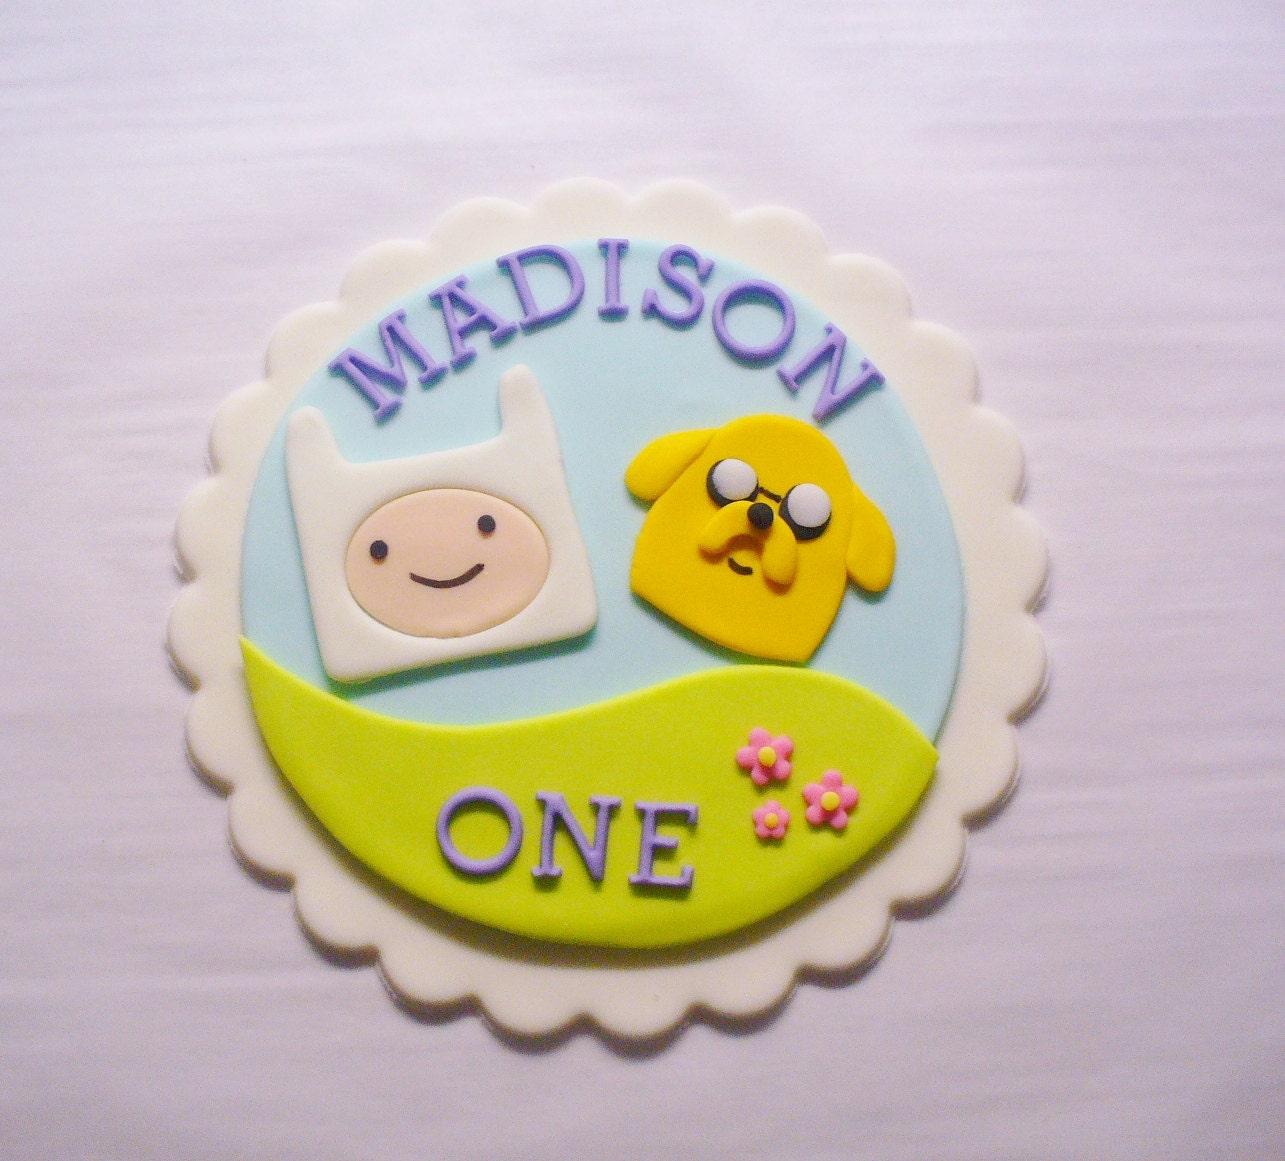 ADVENTURE TIME Fondant Cake Topper Plaque Baby Girl | Etsy